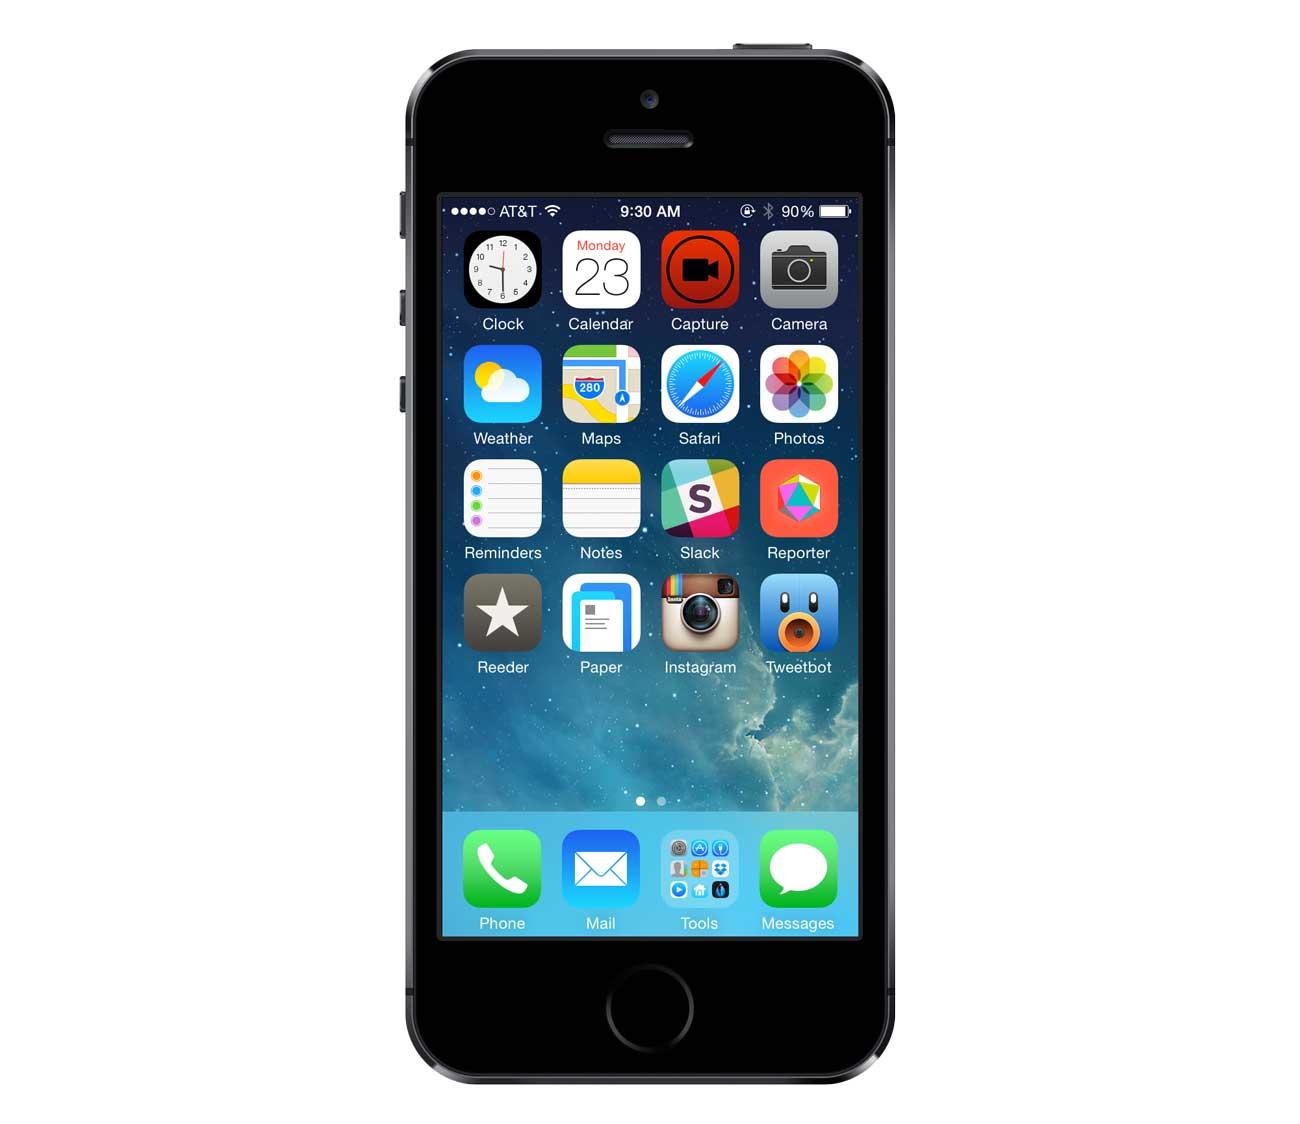 Chuck Skoda's iPhone